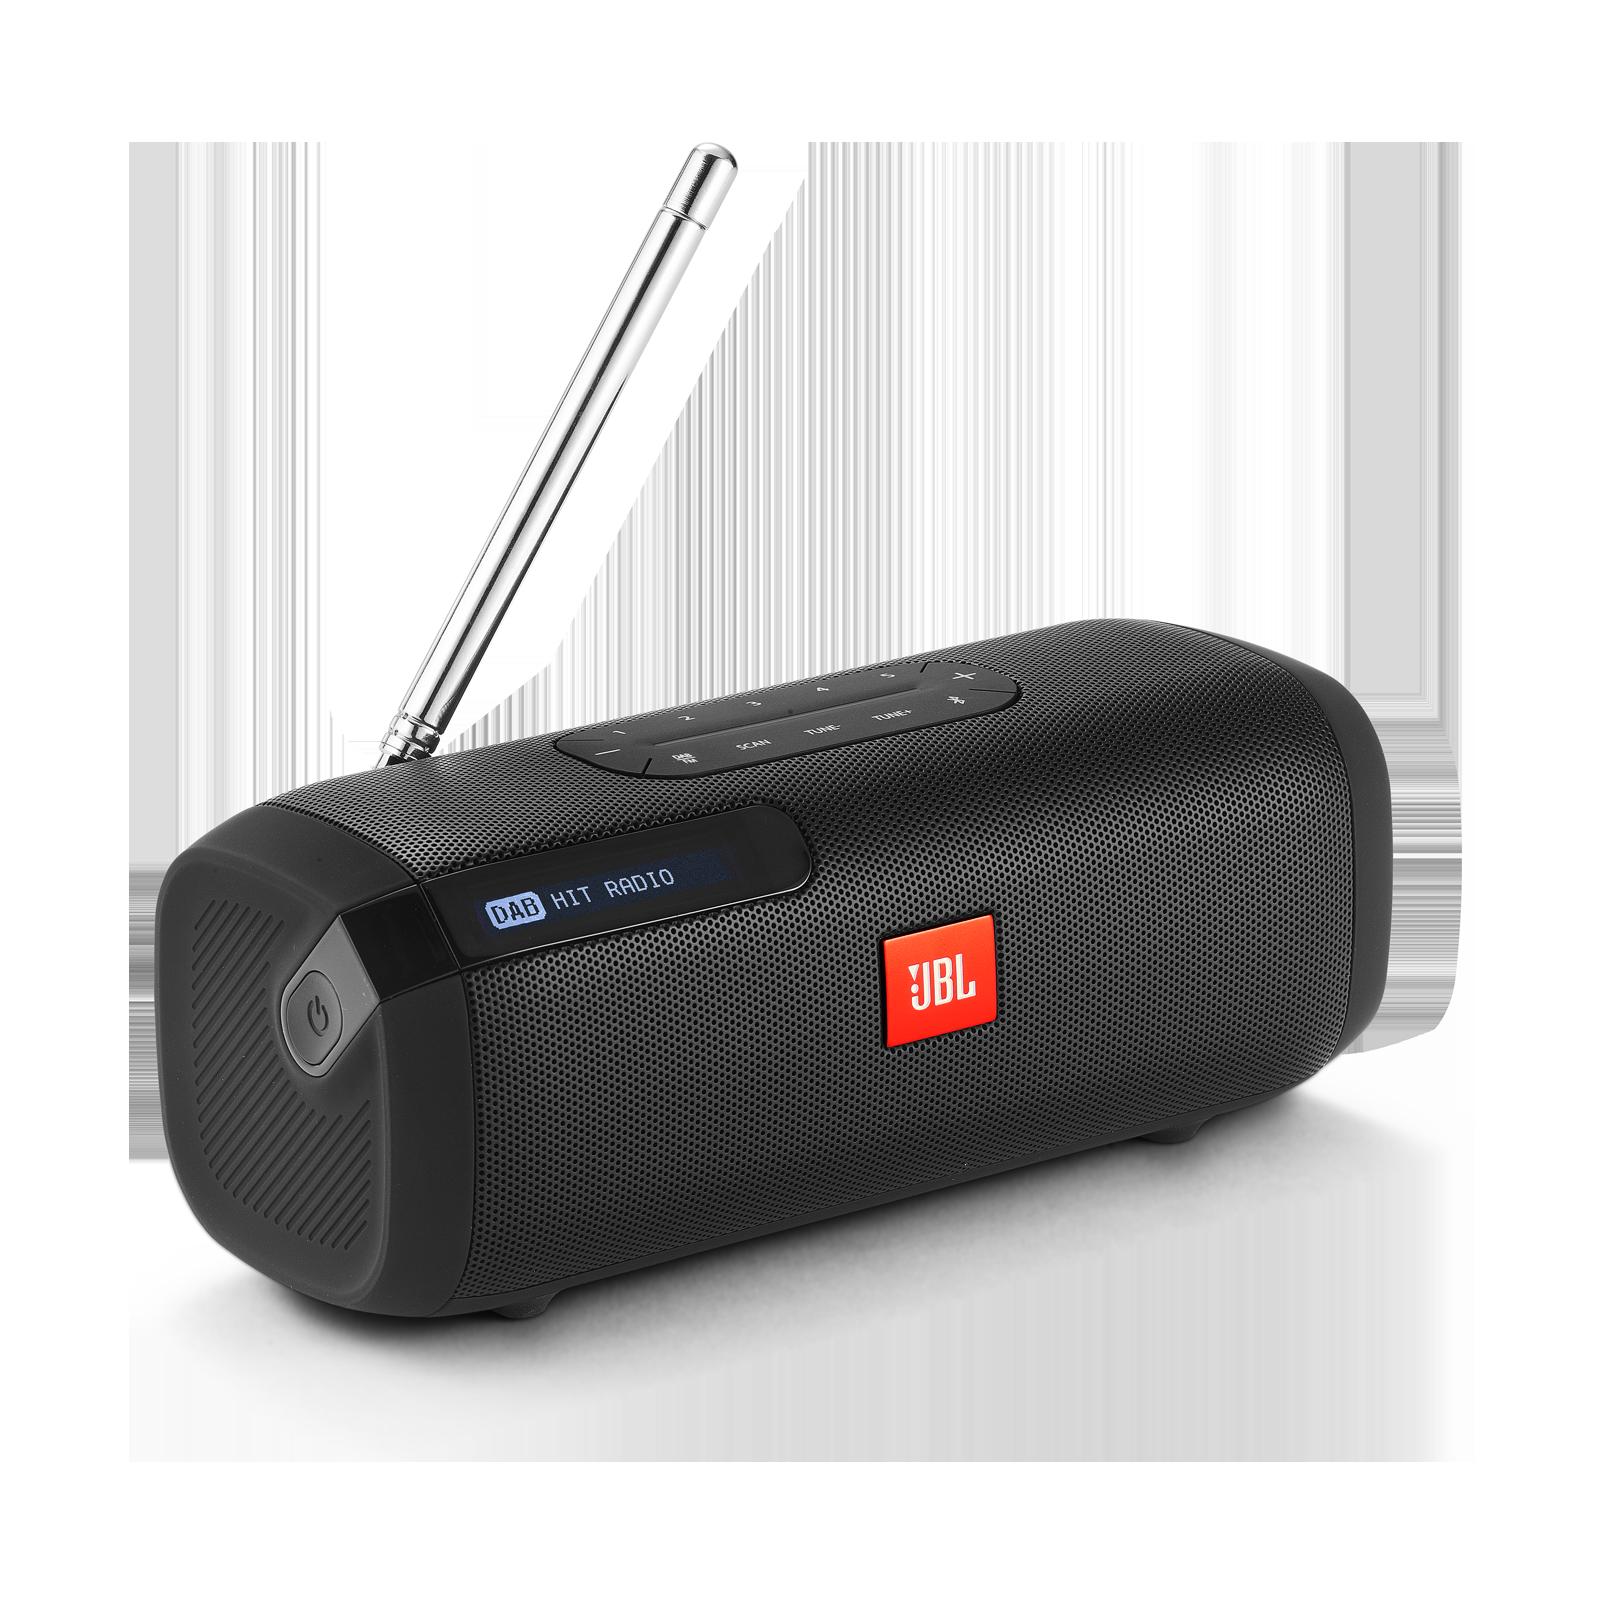 Jbl Tuner Portable Bluetooth Speaker With Dab Fm Radio